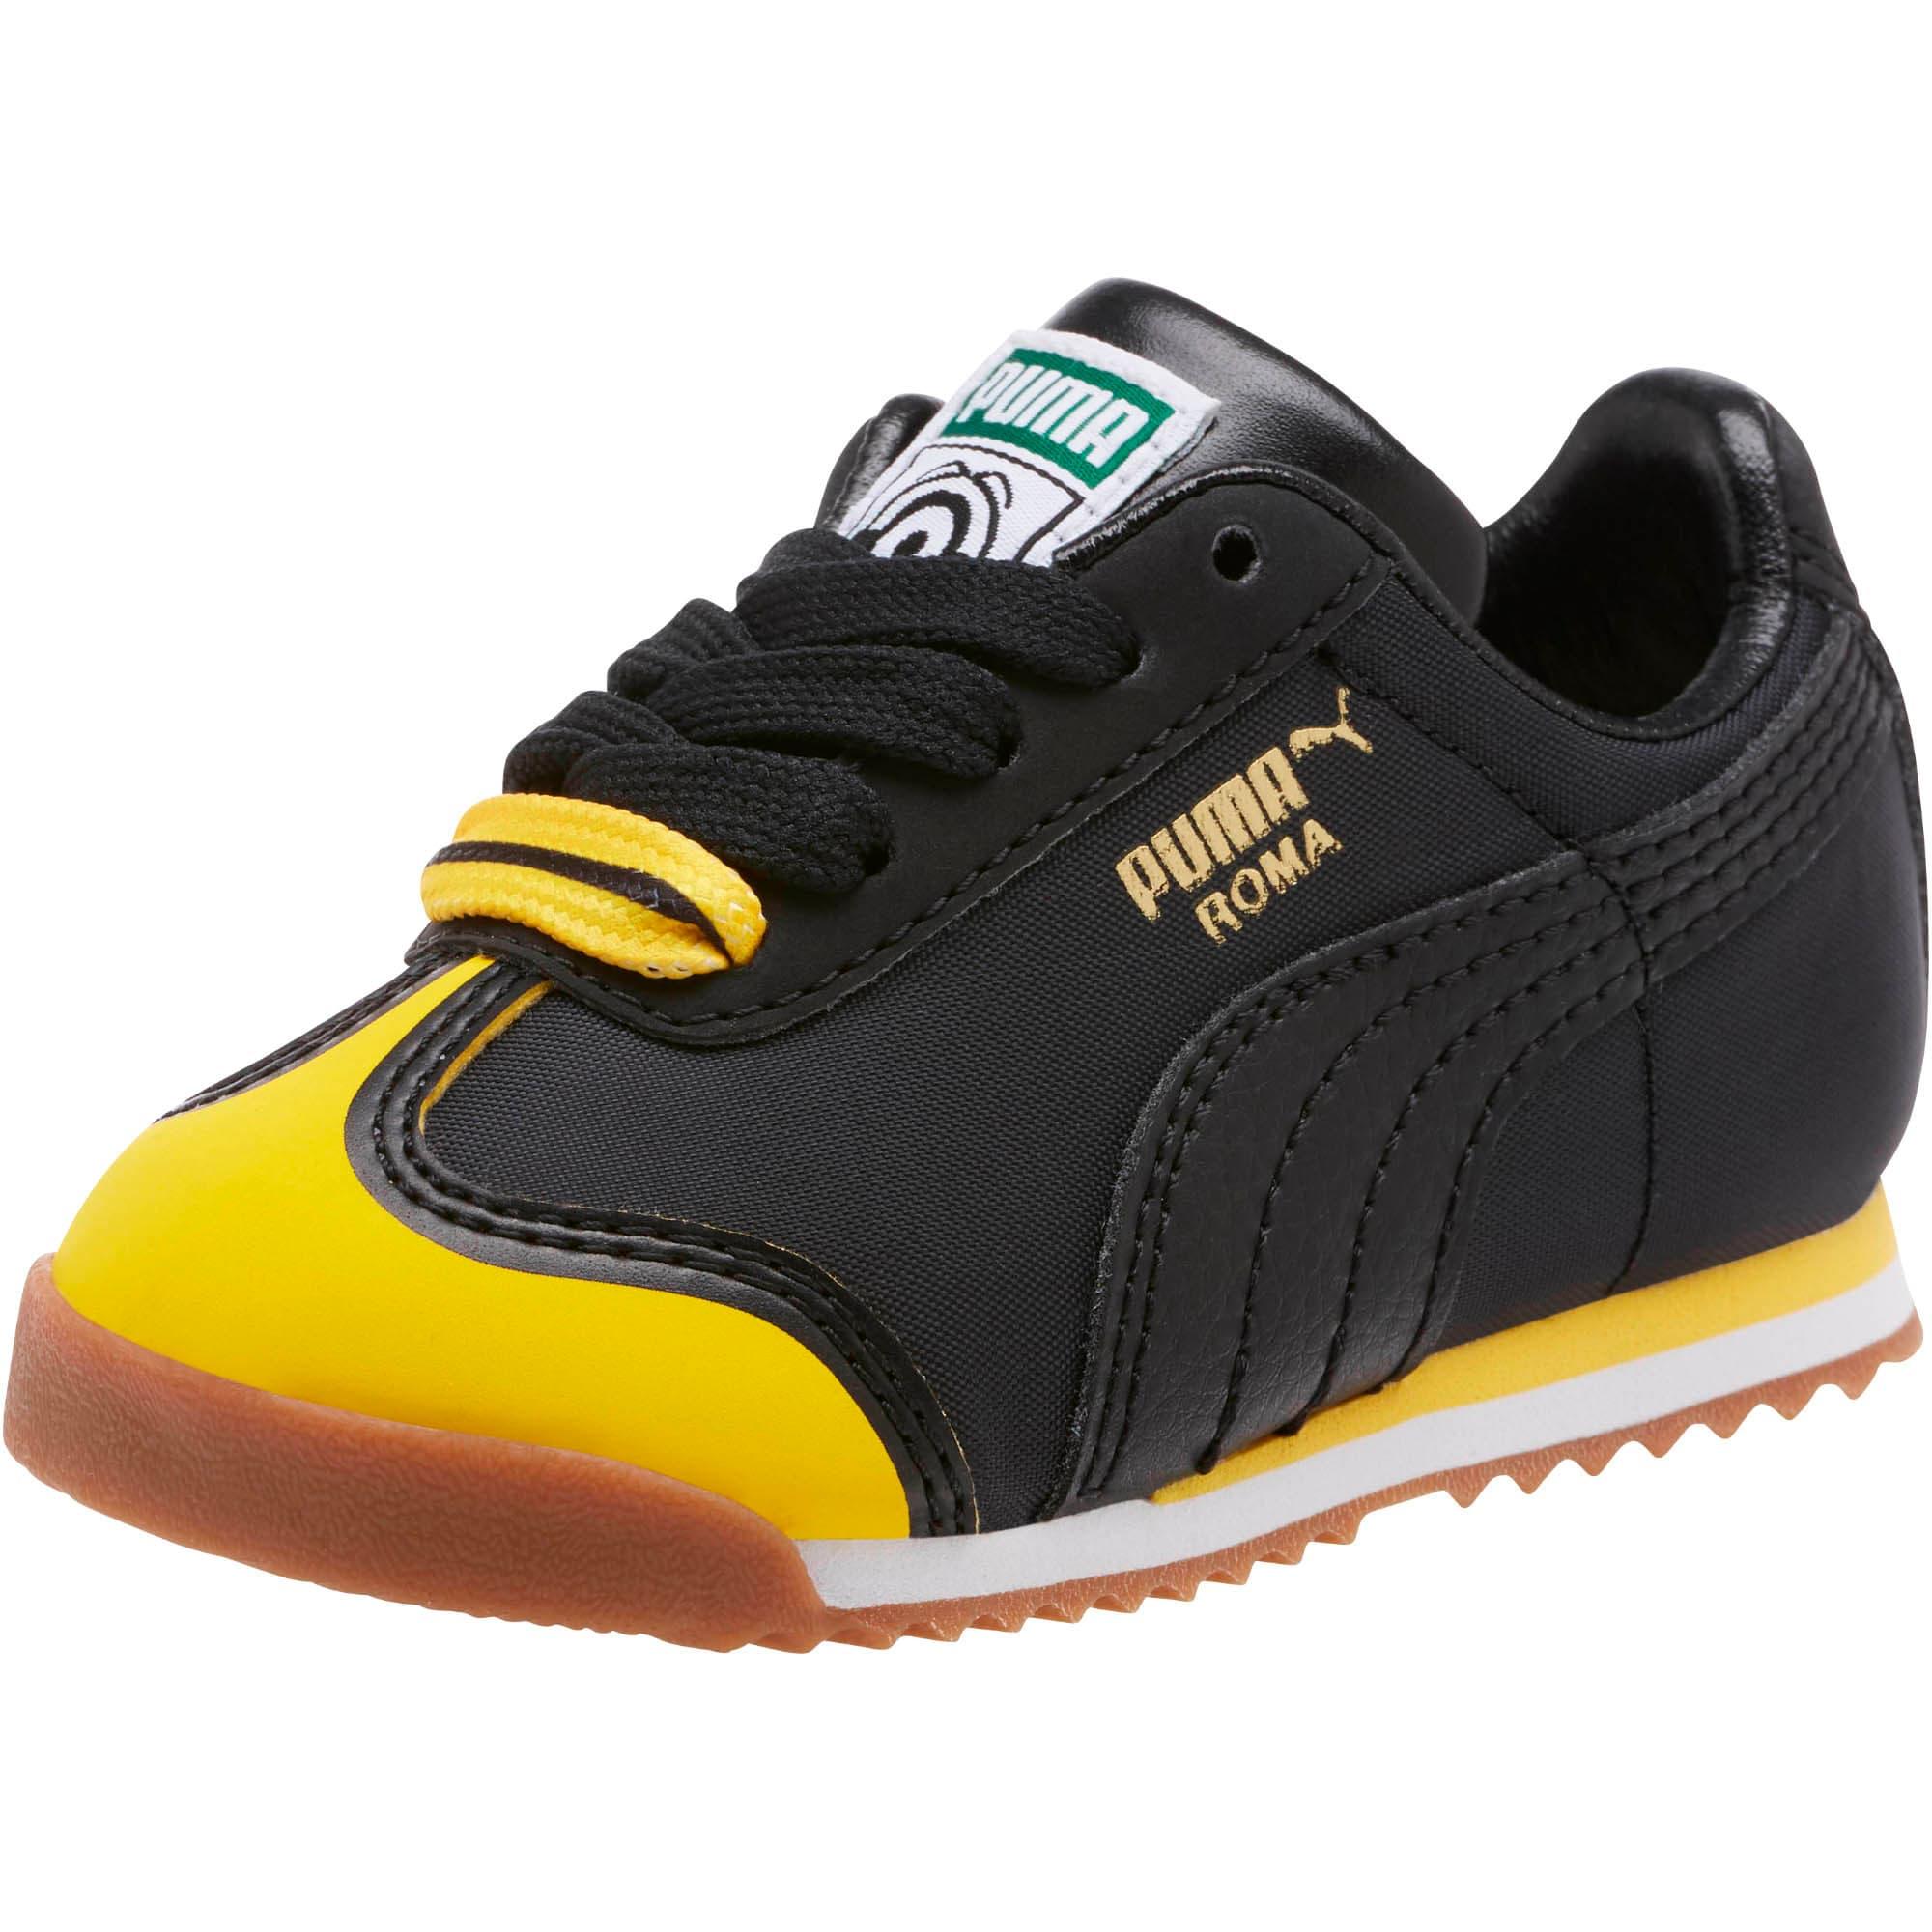 Thumbnail 1 of Minions Roma Toddler Shoes, Black-Minion Yellow-Black, medium